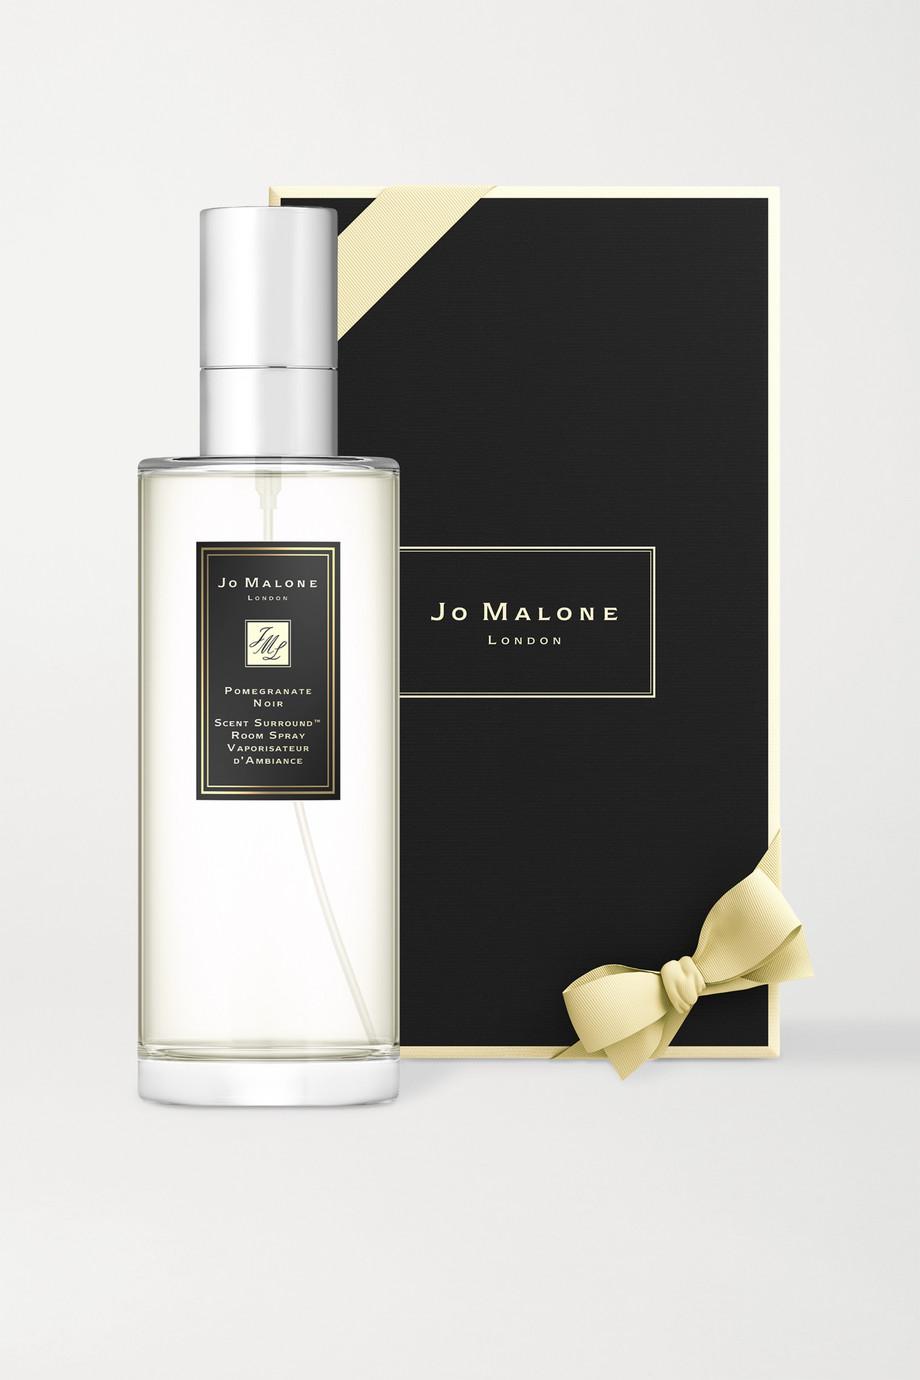 Jo Malone London Scent Surround Room Spray - Pomegranate Noir, 175ml